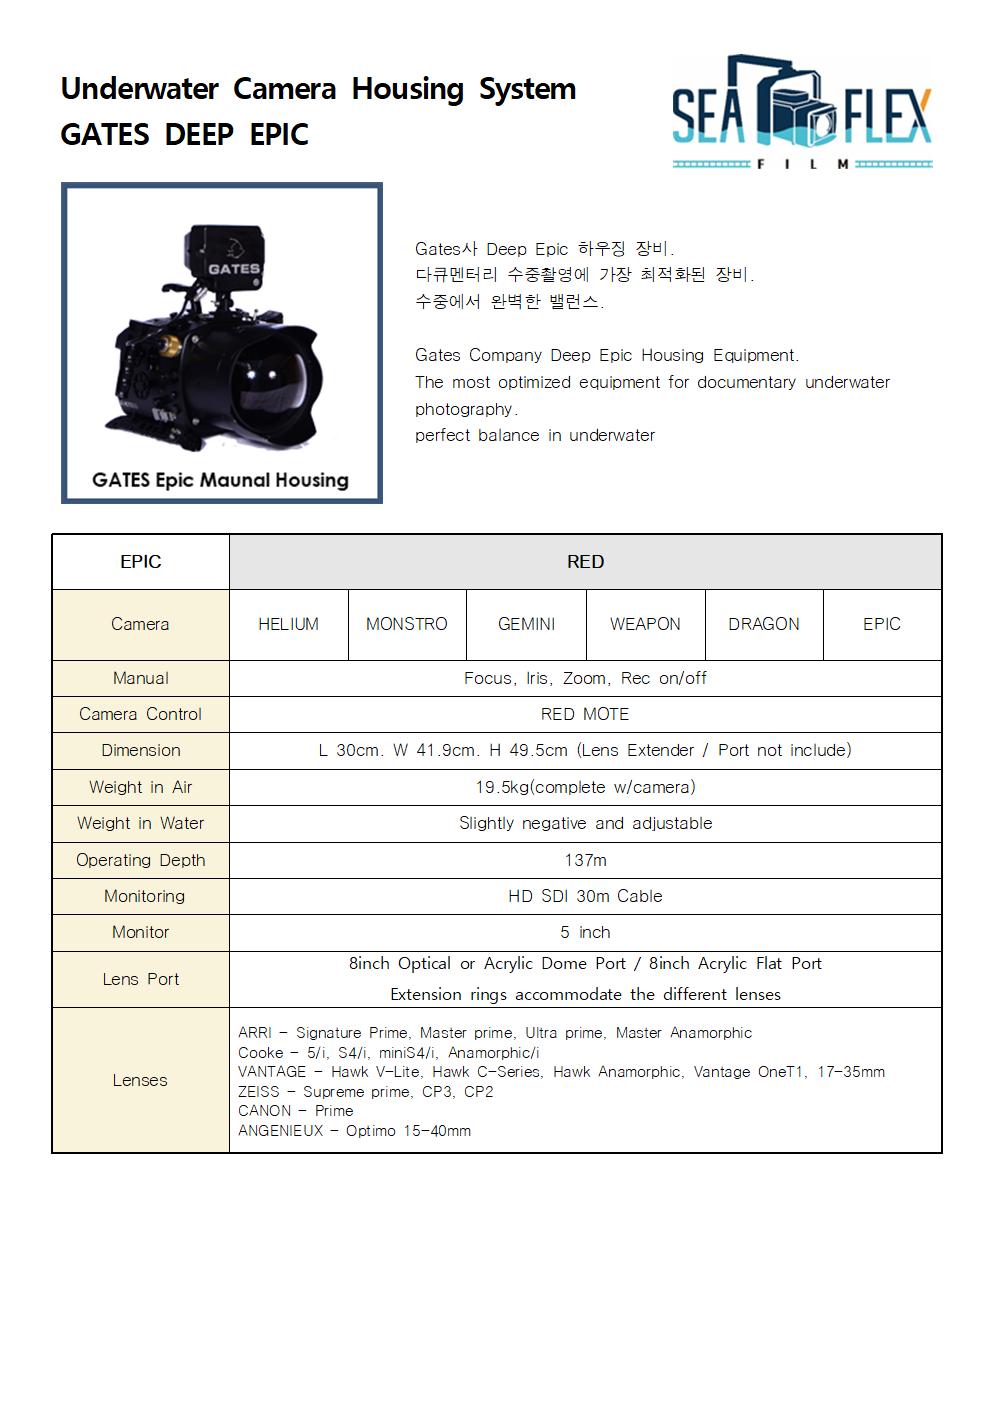 seaflex manual cam_gates.png